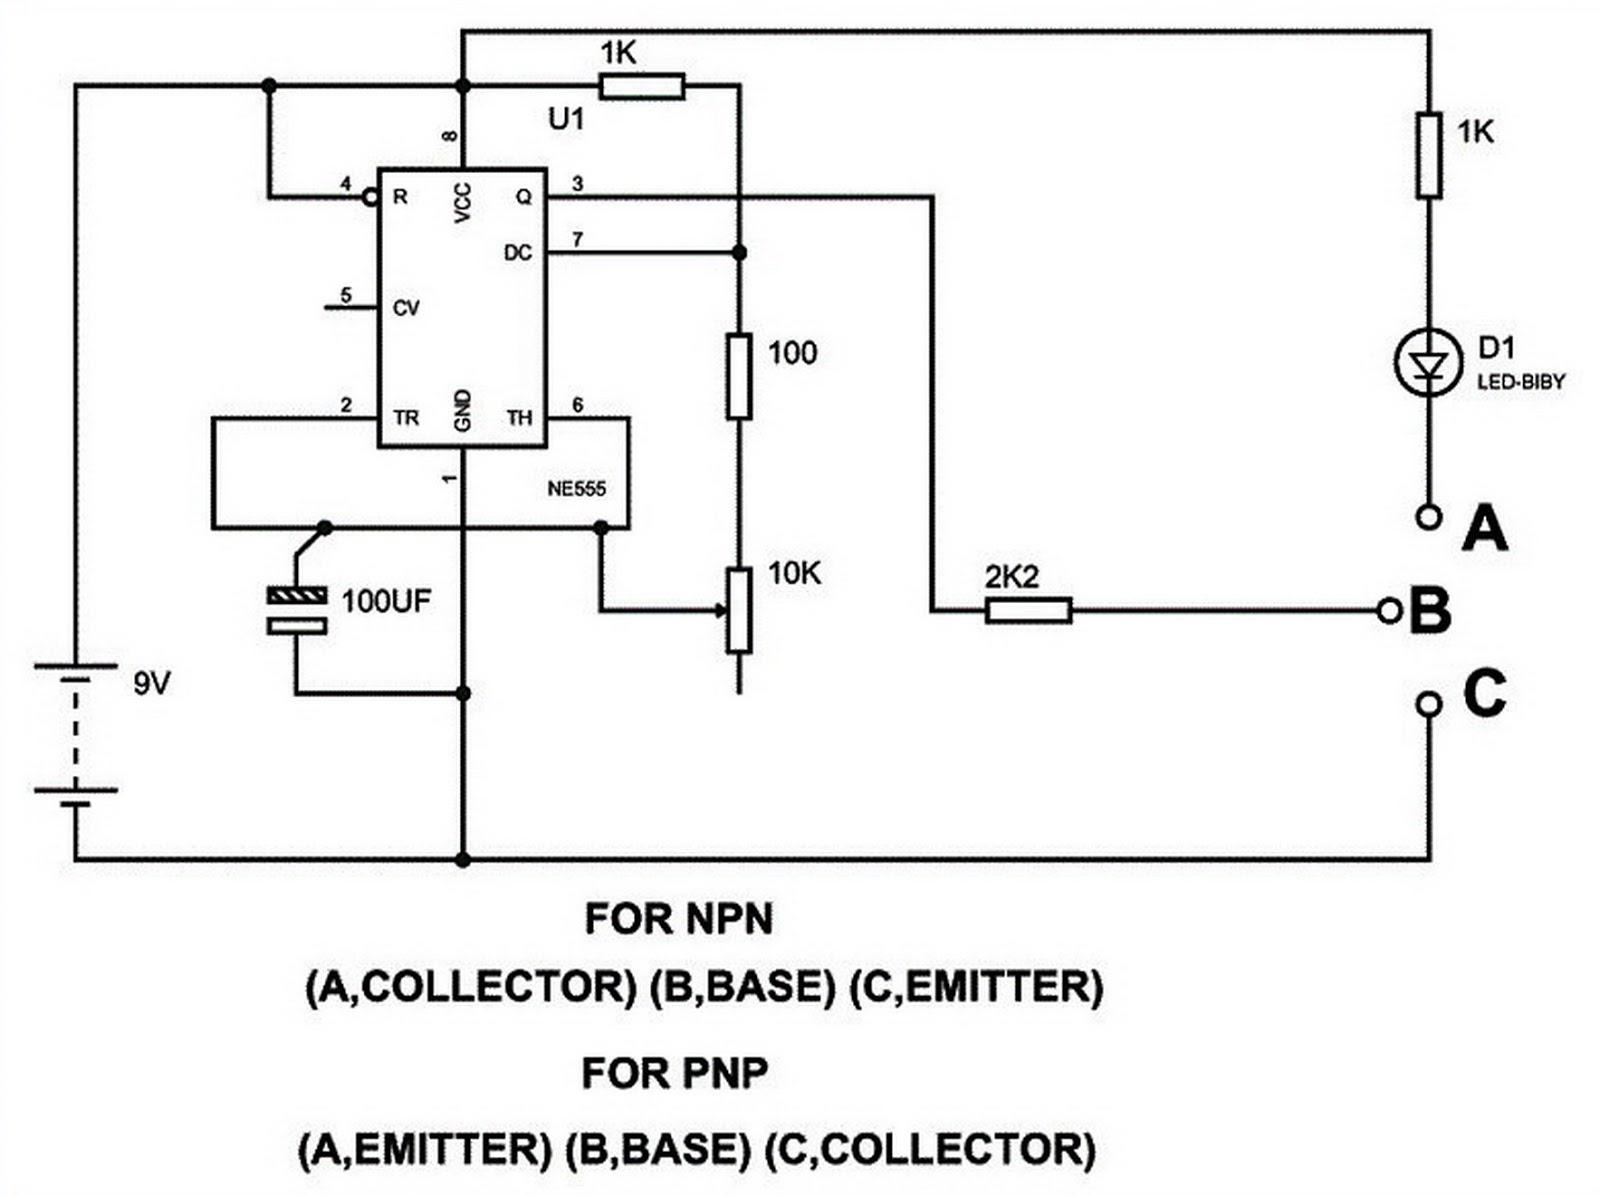 Circuito Transistor : EletrÔnica geral: teste de transistor usando ci 555